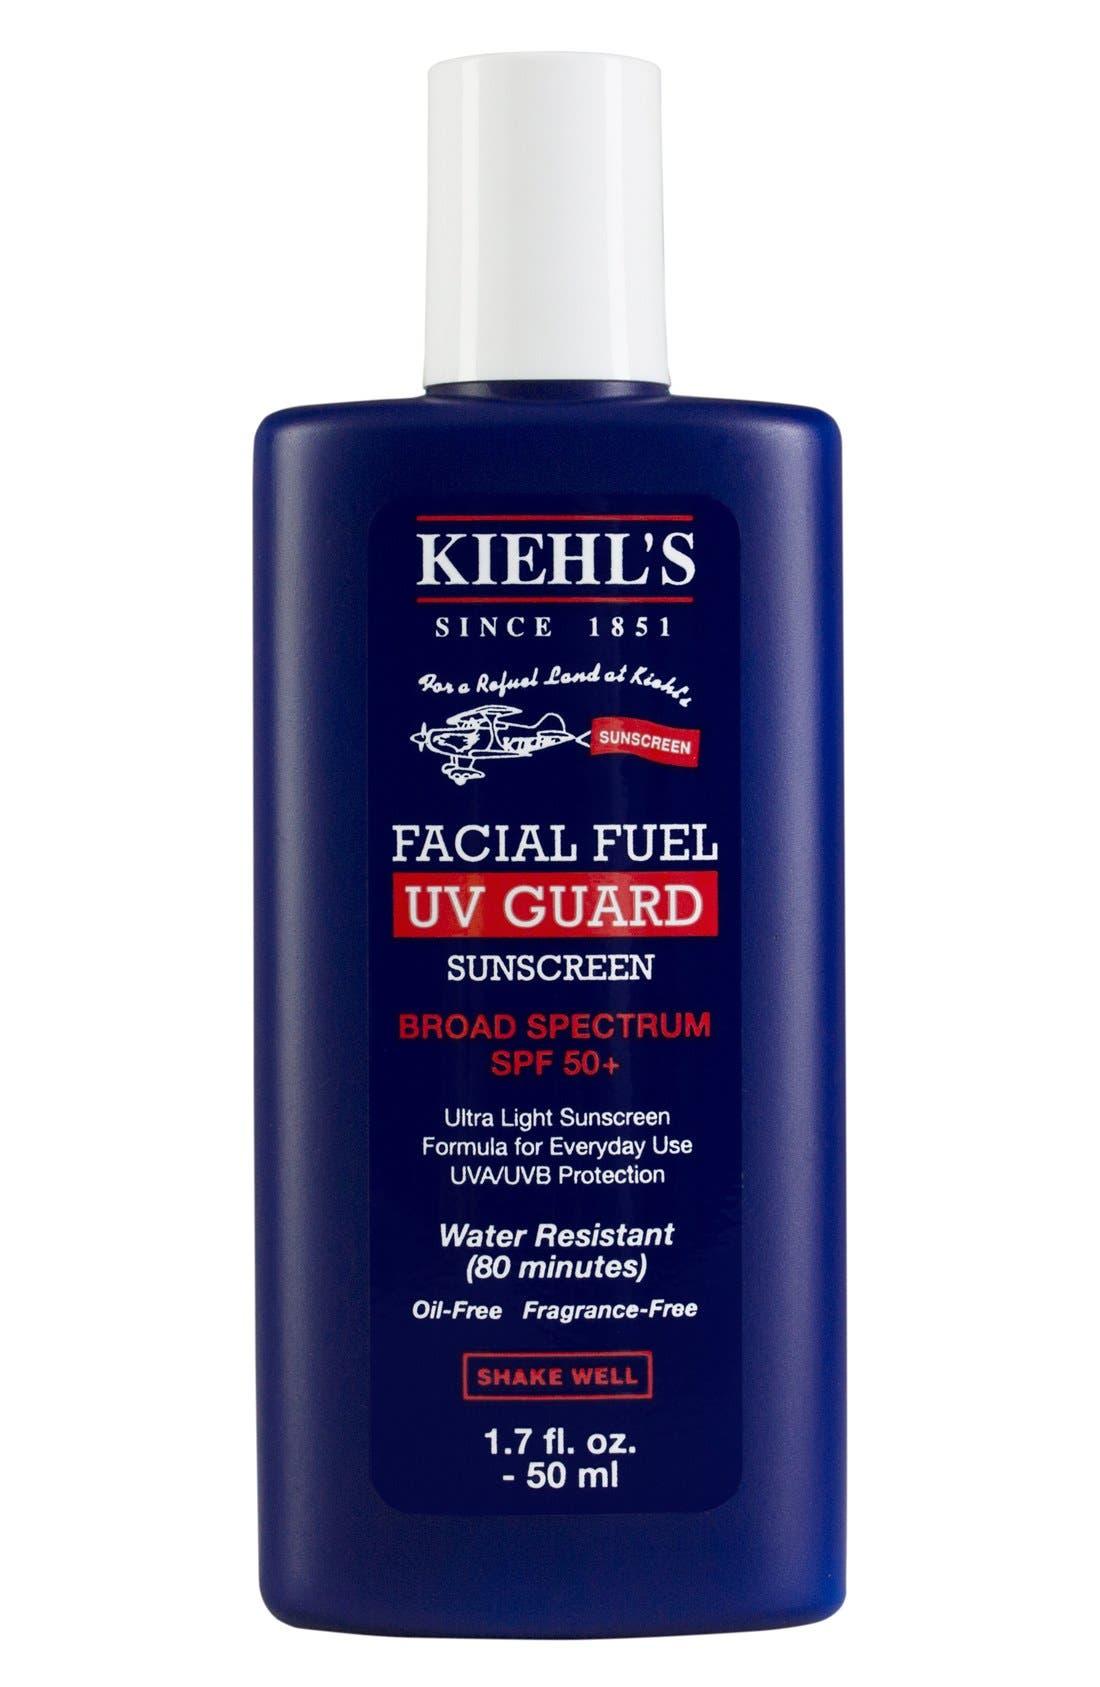 KIEHL'S SINCE 1851 'Facial Fuel - UV Guard' Sunscreen SPF 50, Main, color, 000